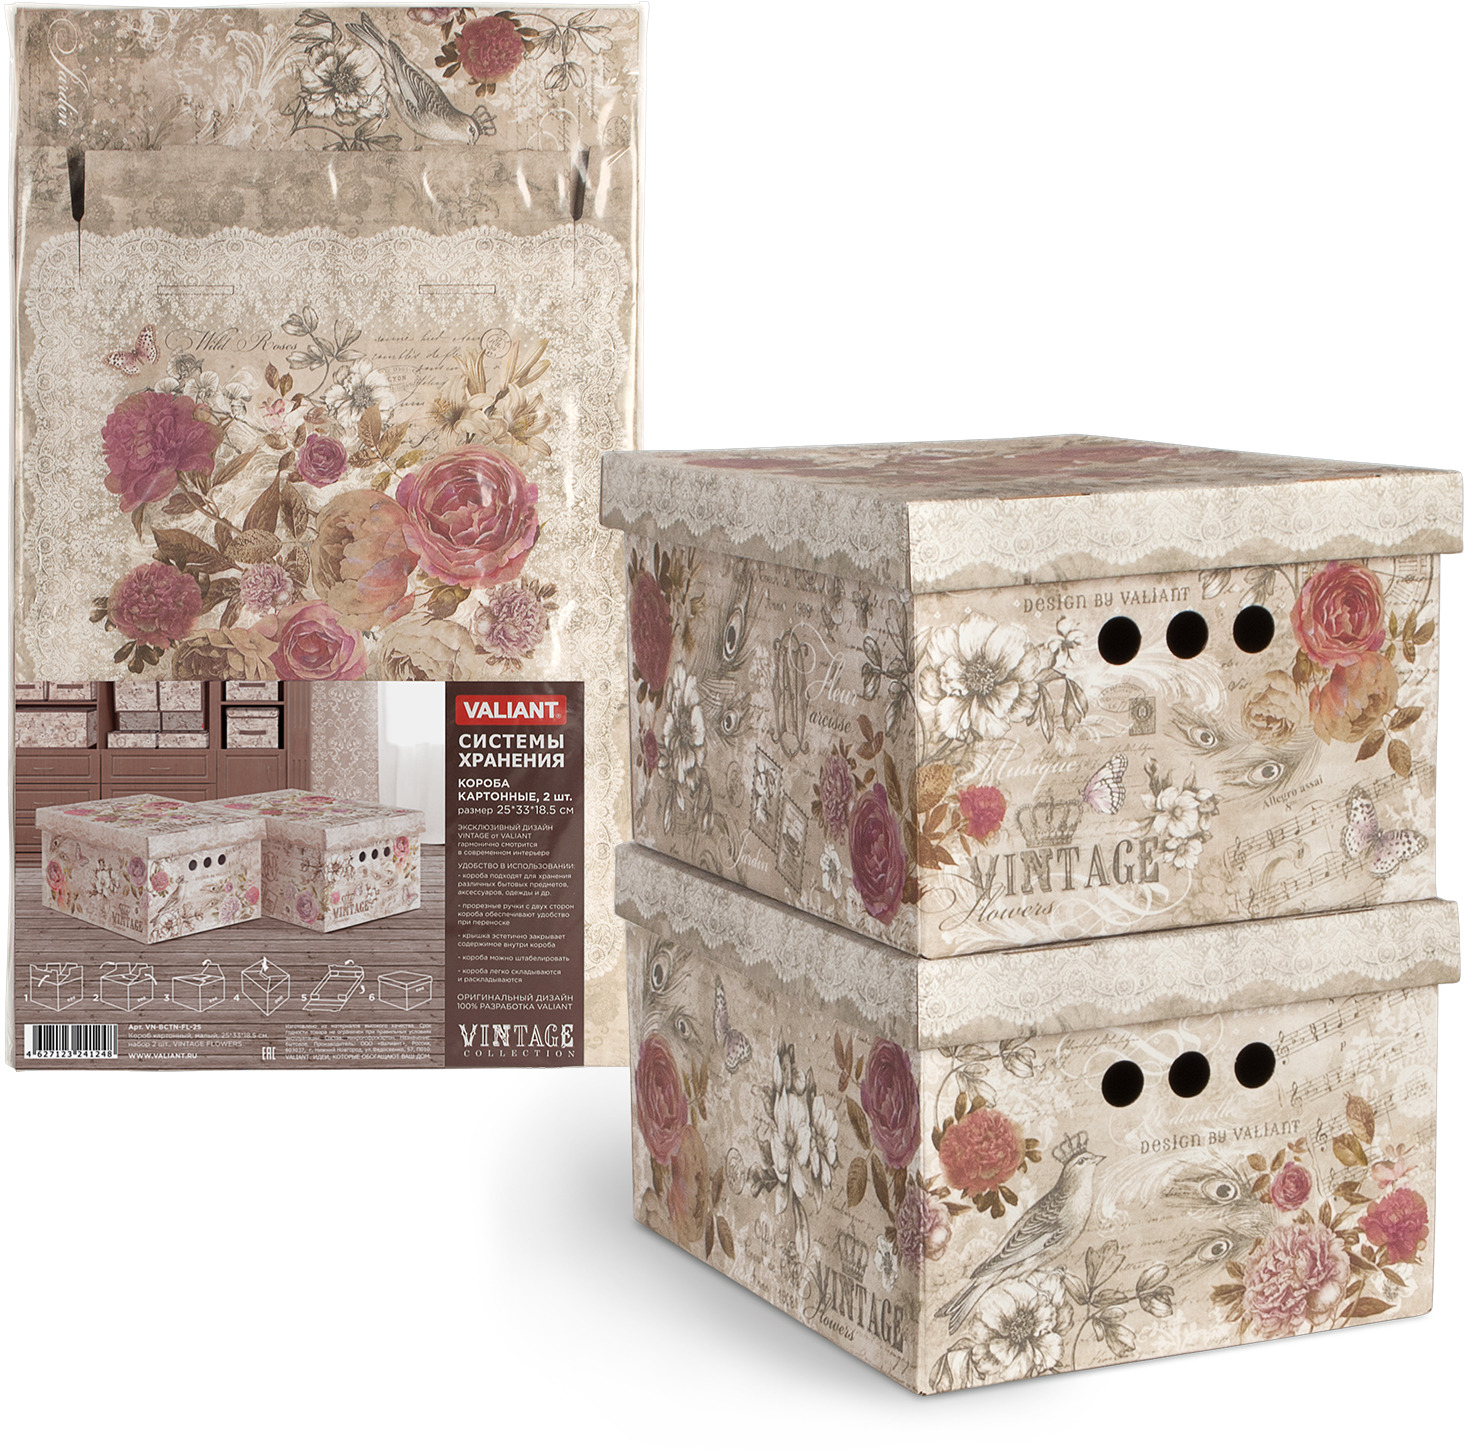 Кофр для хранения вещей Valiant Vintage, цвет: коричнево-красный, 25 х 33 х 18,5 см набор коробок valiant travelling line складных 25 х 33 х 18 5 см 2 шт